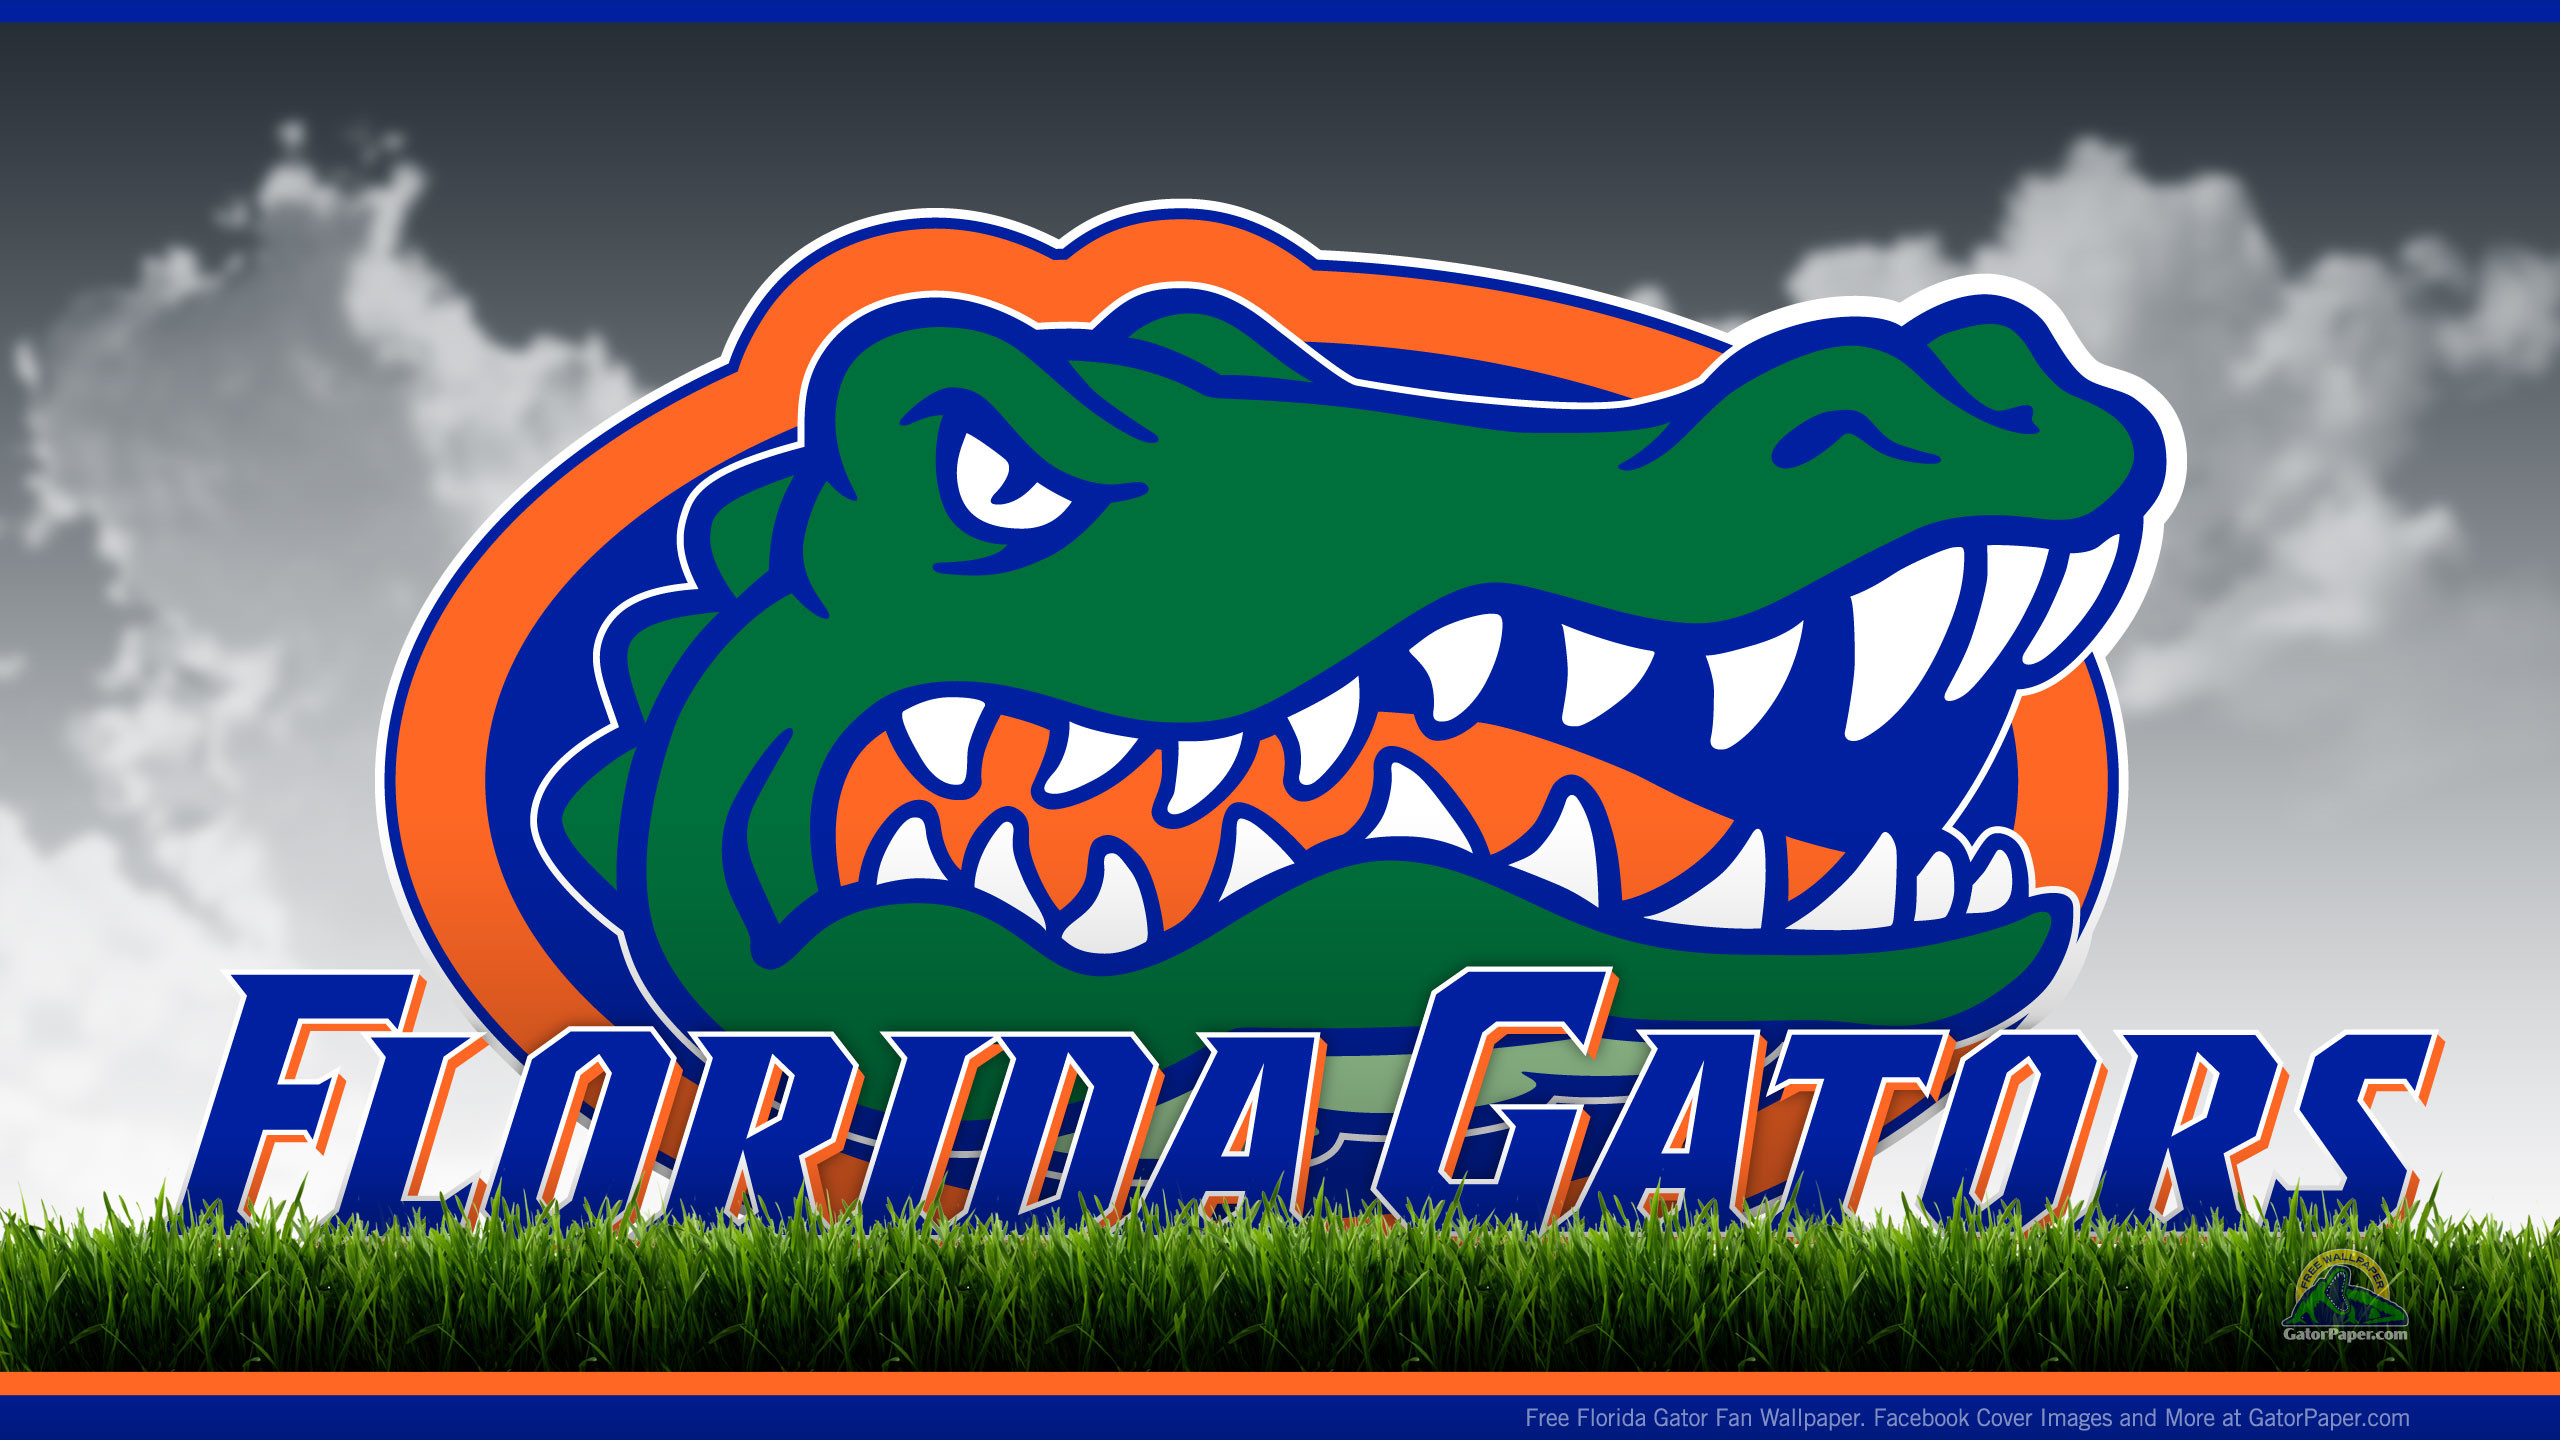 Cool Florida Gator Wallpapers 71 Images